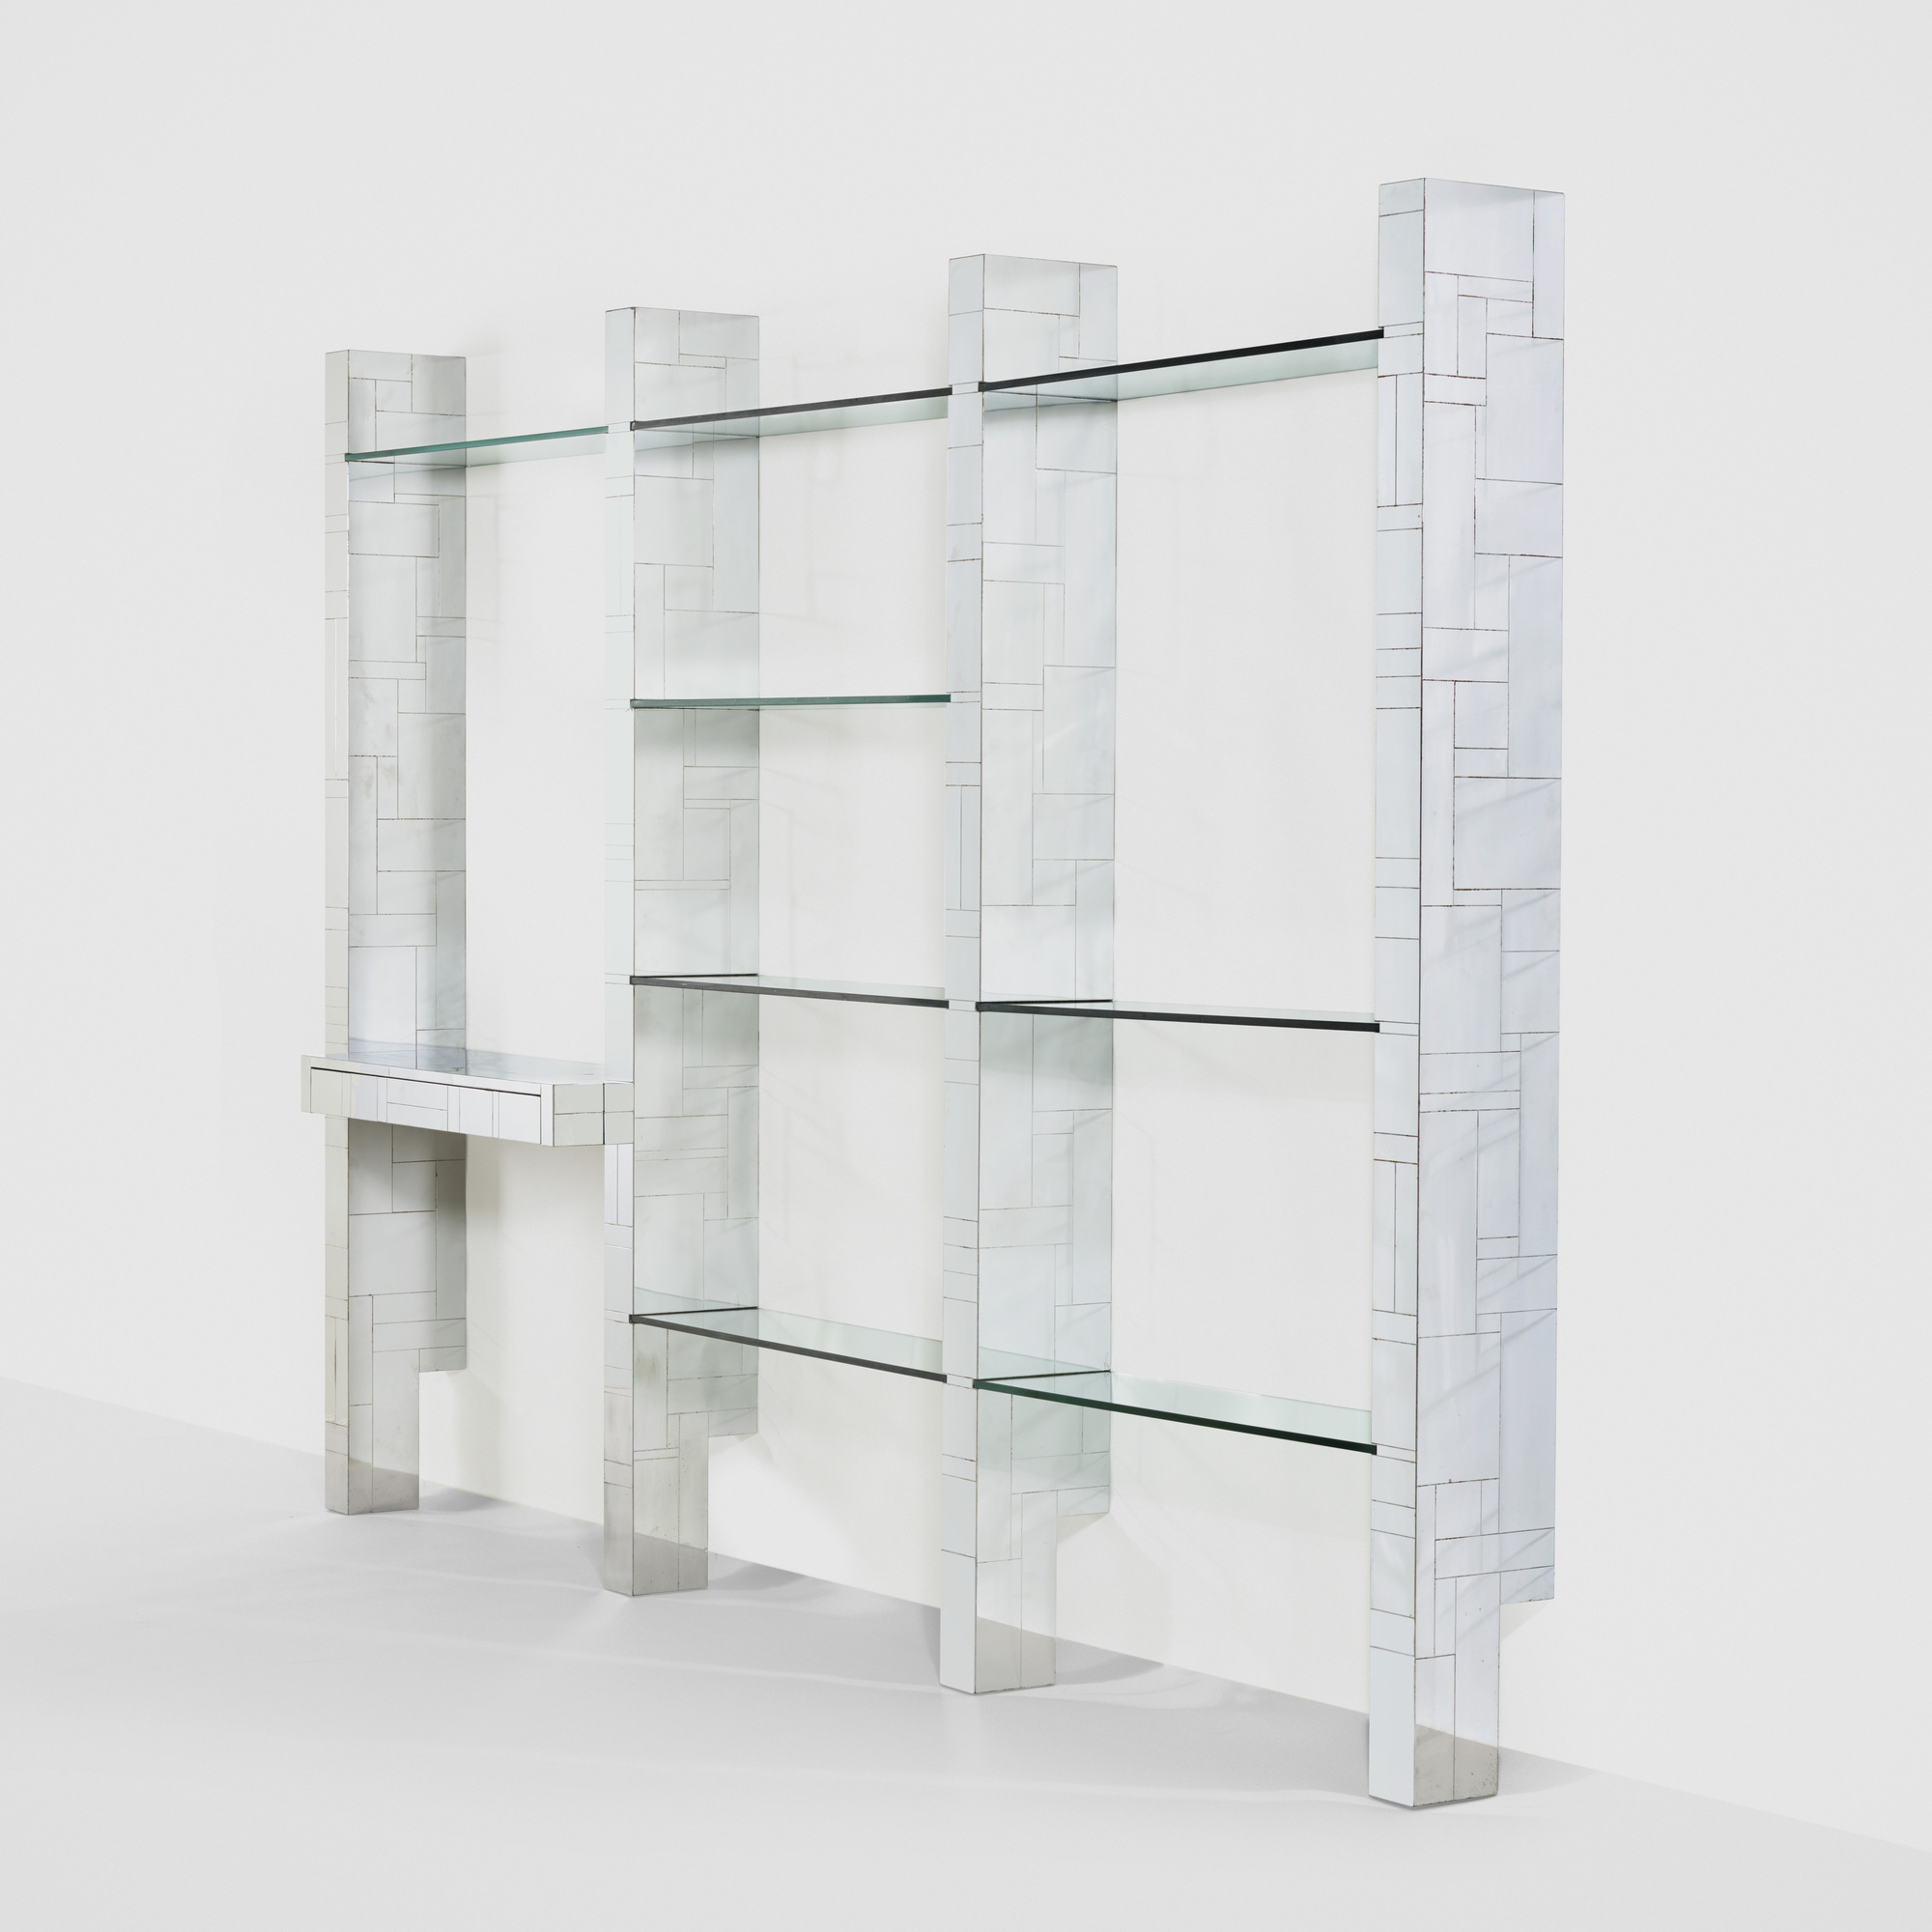 256: Paul Evans / Cityscape wall-mounted bookshelf (1 of 1)